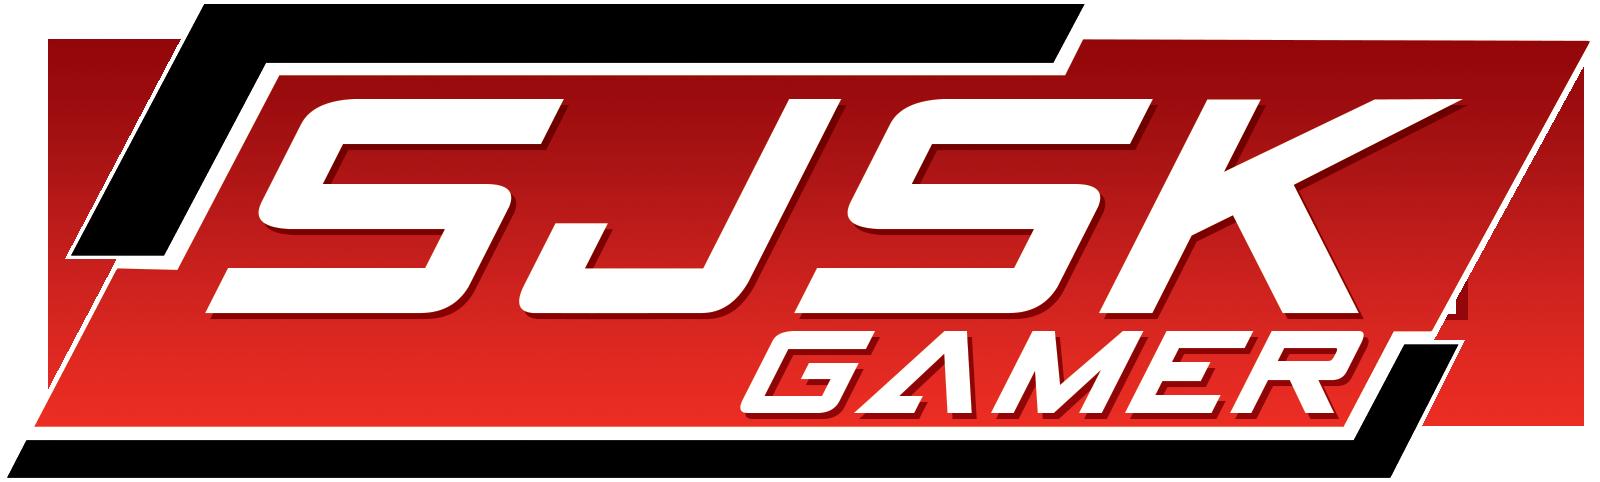 SJSK Gamer : ร้านขายเกม PC รูปแบบ Gitf คีย์ Digital Download  และ ID เกม Fate Grand Order SWORD ART ONLINE – MEMORY DEFRAG  และเกมชั้นนำอื่นๆอีกมากมาย